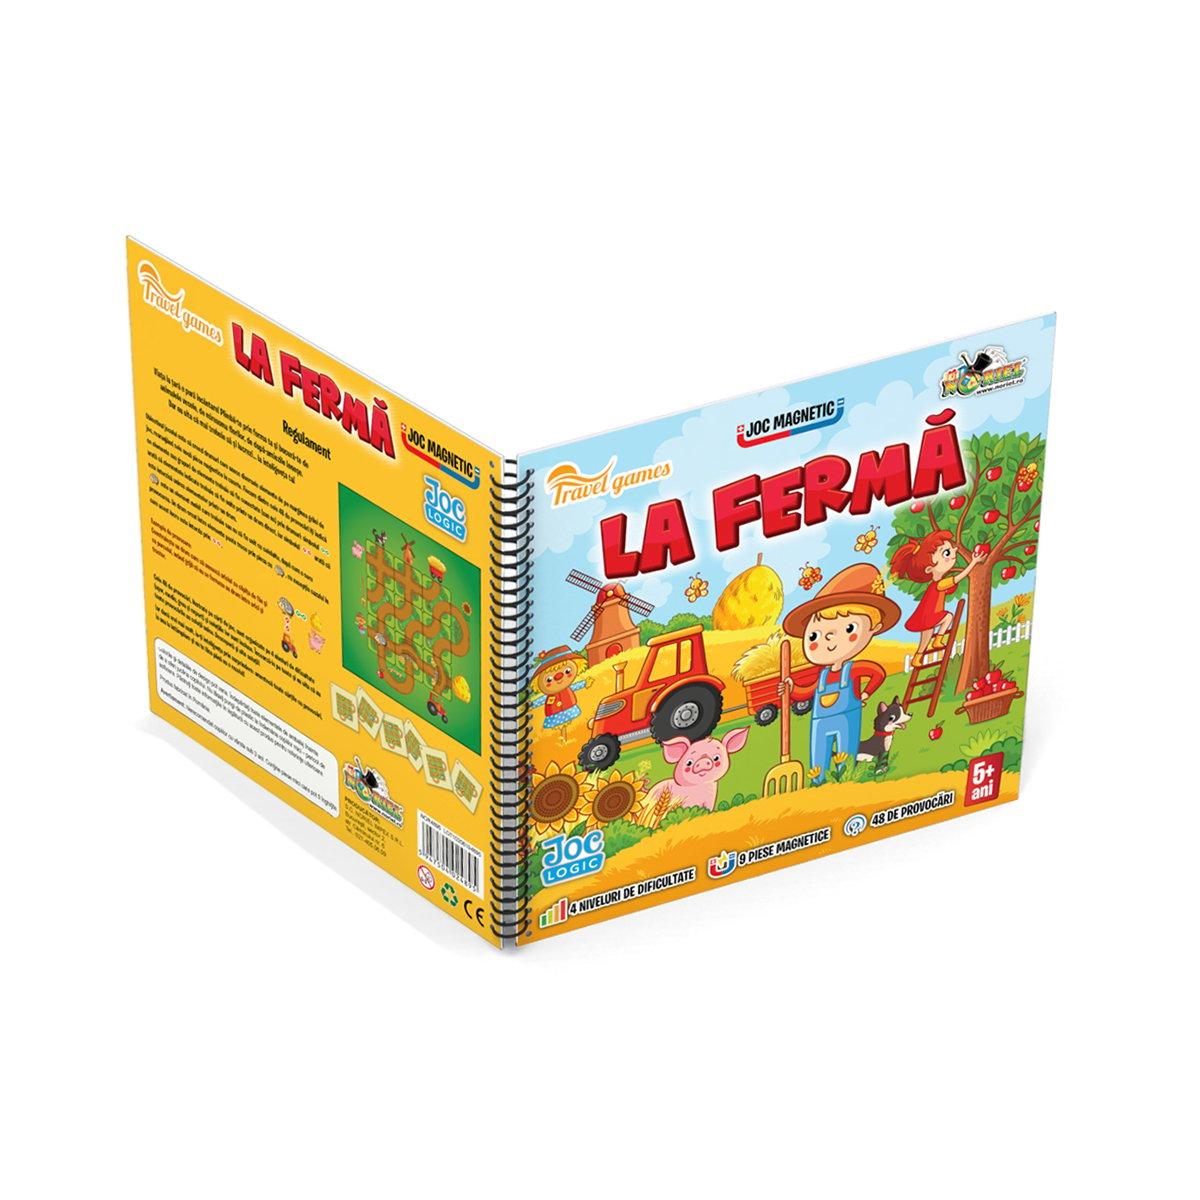 Joc magnetic interactiv Noriel Games, La ferma